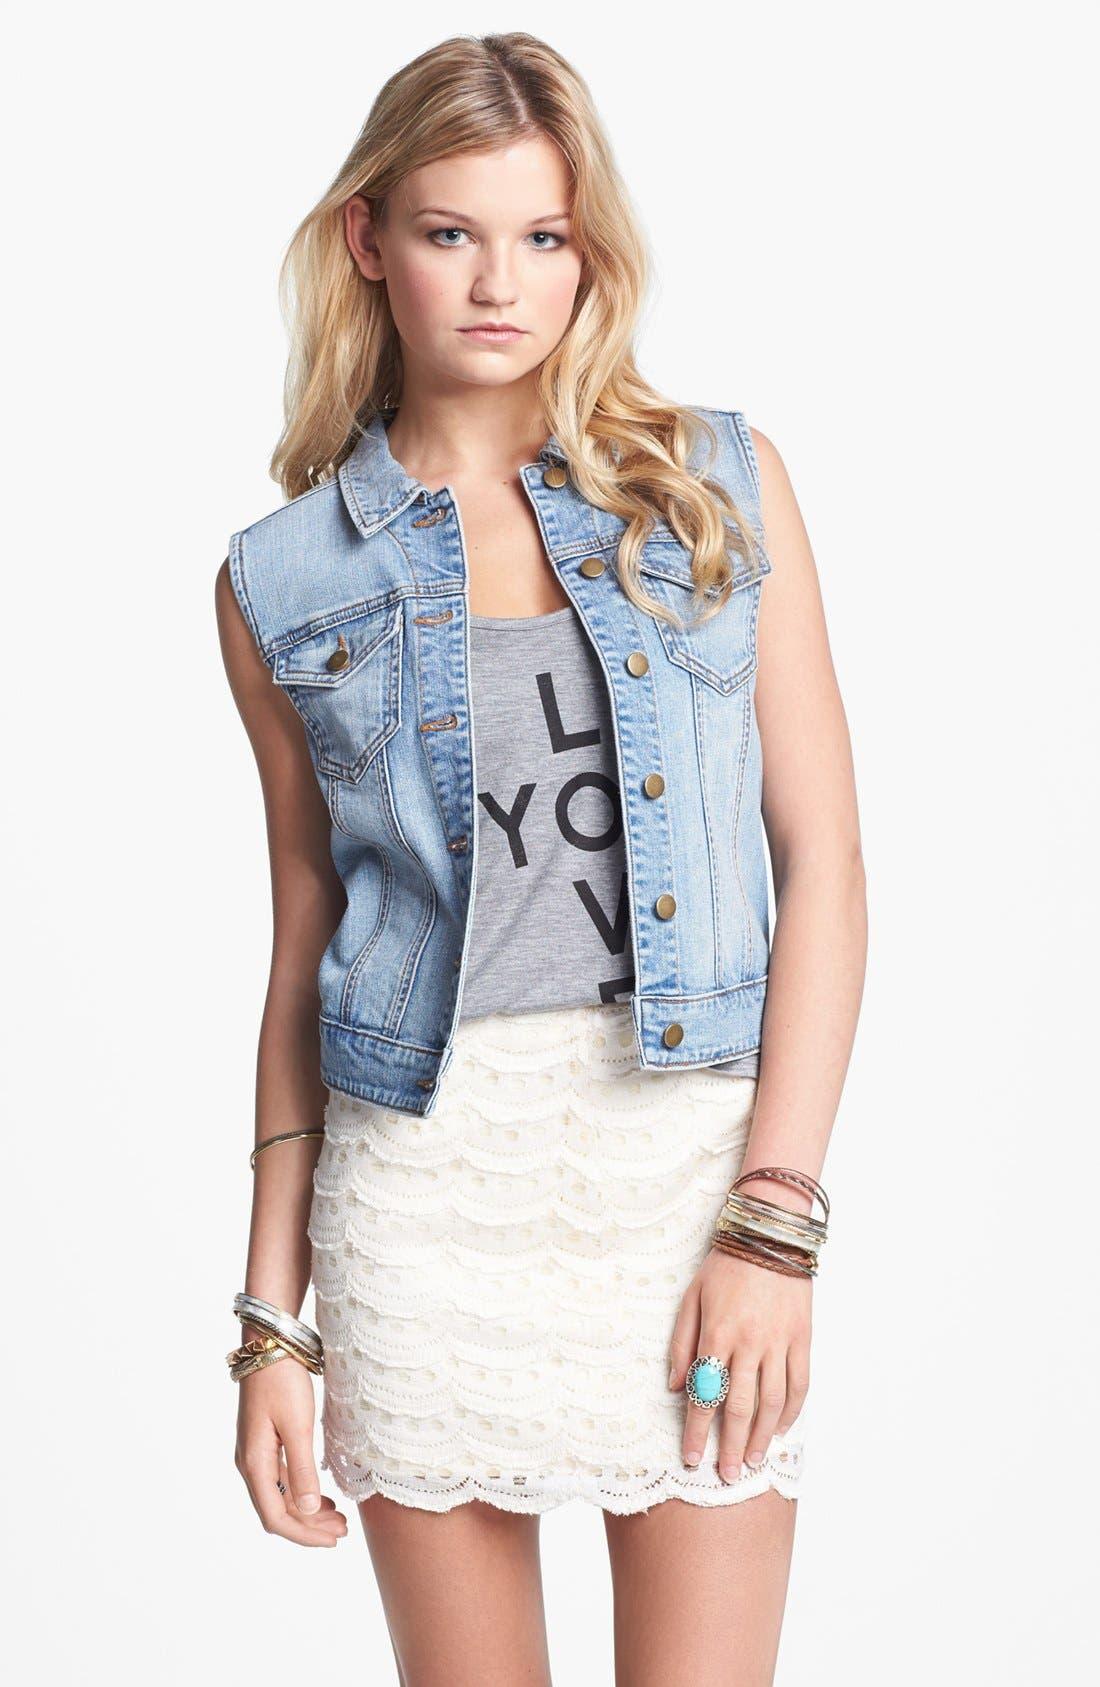 Alternate Image 1 Selected - BCNU Scallop Lace Skirt (Juniors)